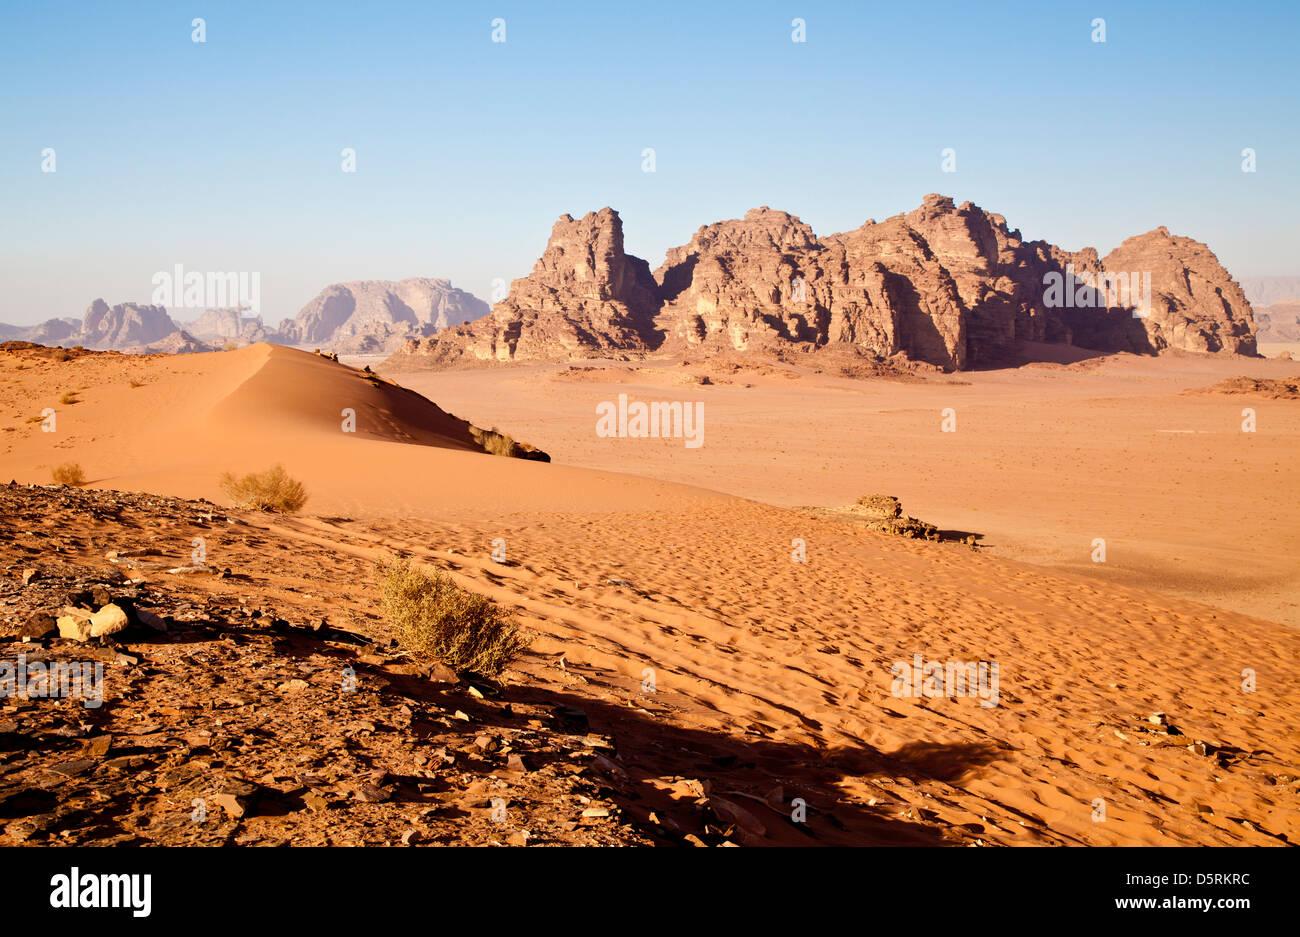 Wadi Rum or Valley of the Moon in Jordan - Stock Image